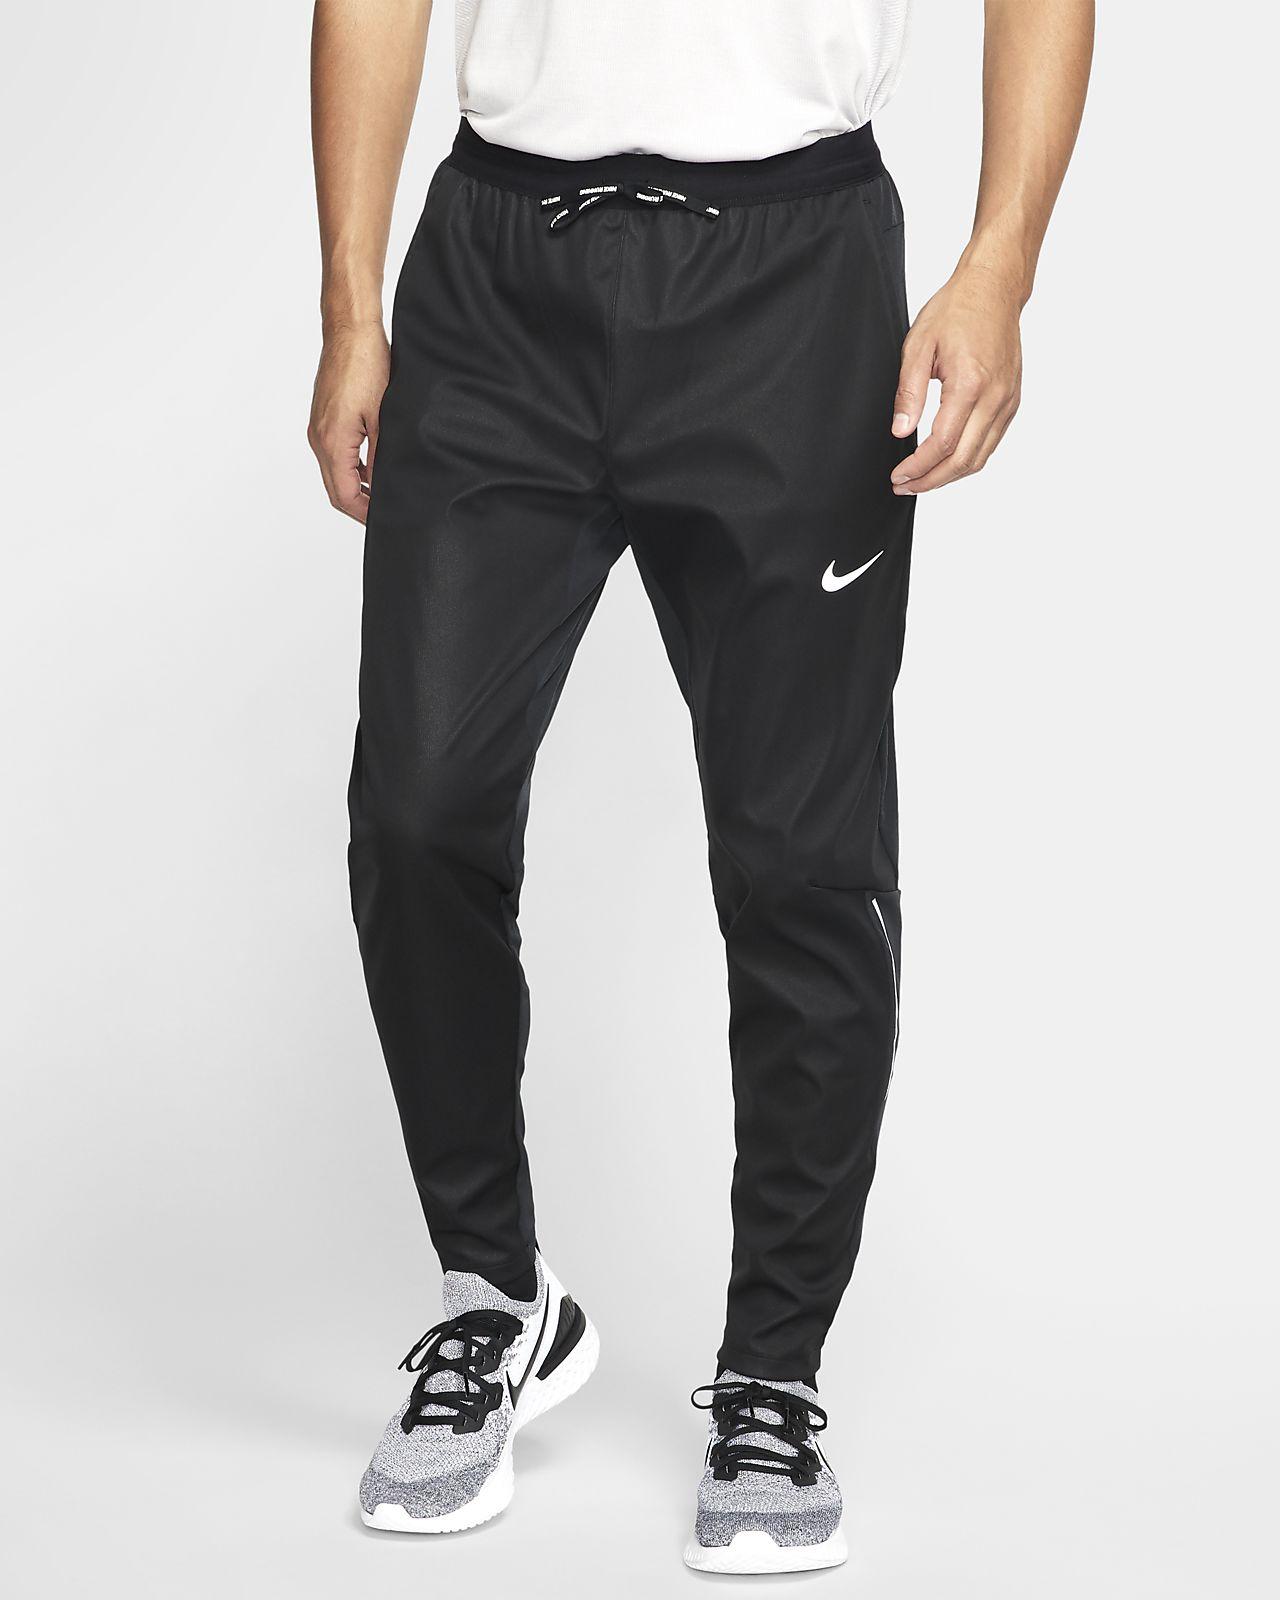 Nike Shield Phenom Erkek Koşu Eşofman Altı